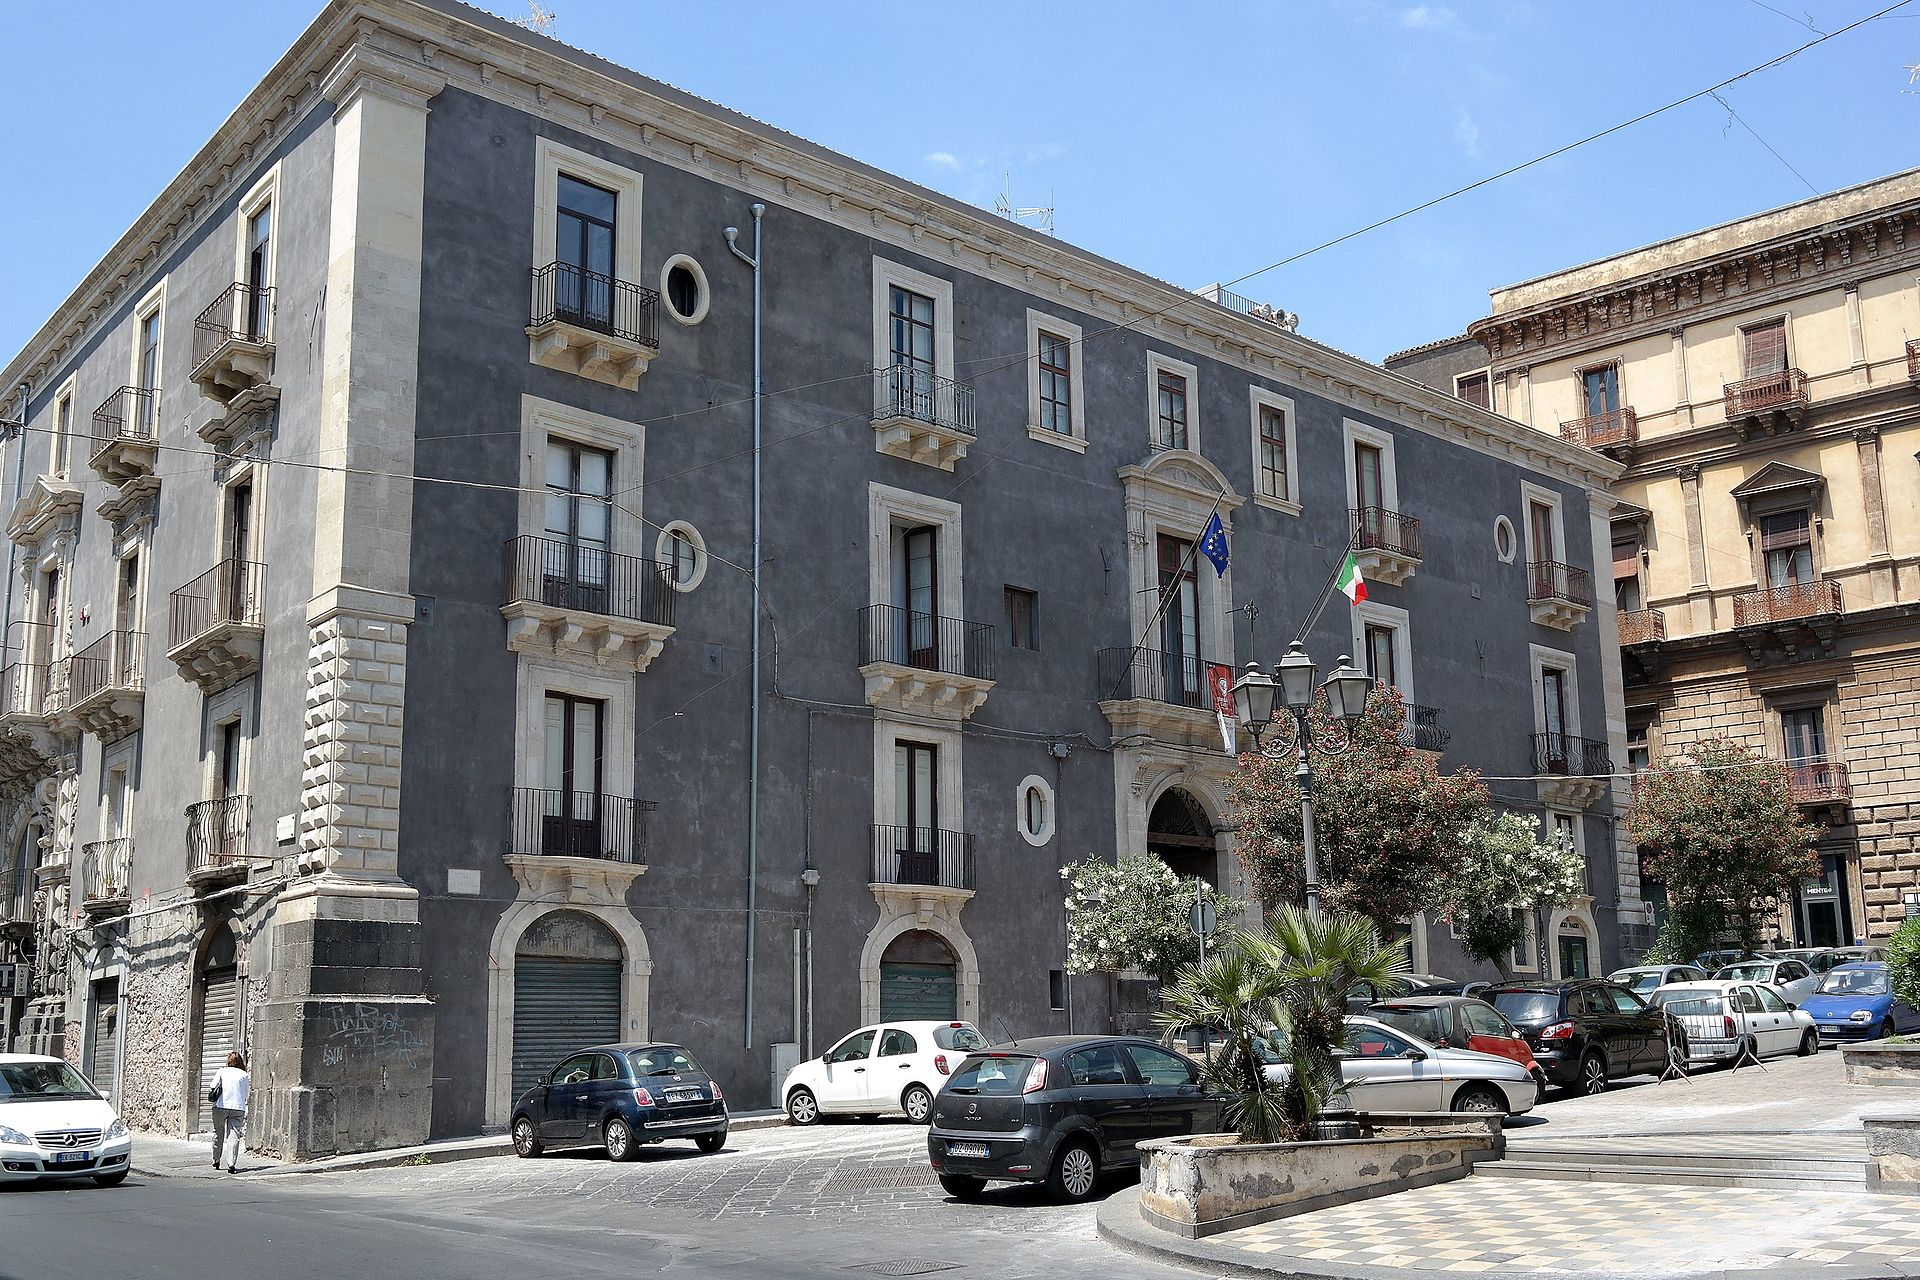 Catania - Palazzo Gravina Cruyllas.jpg